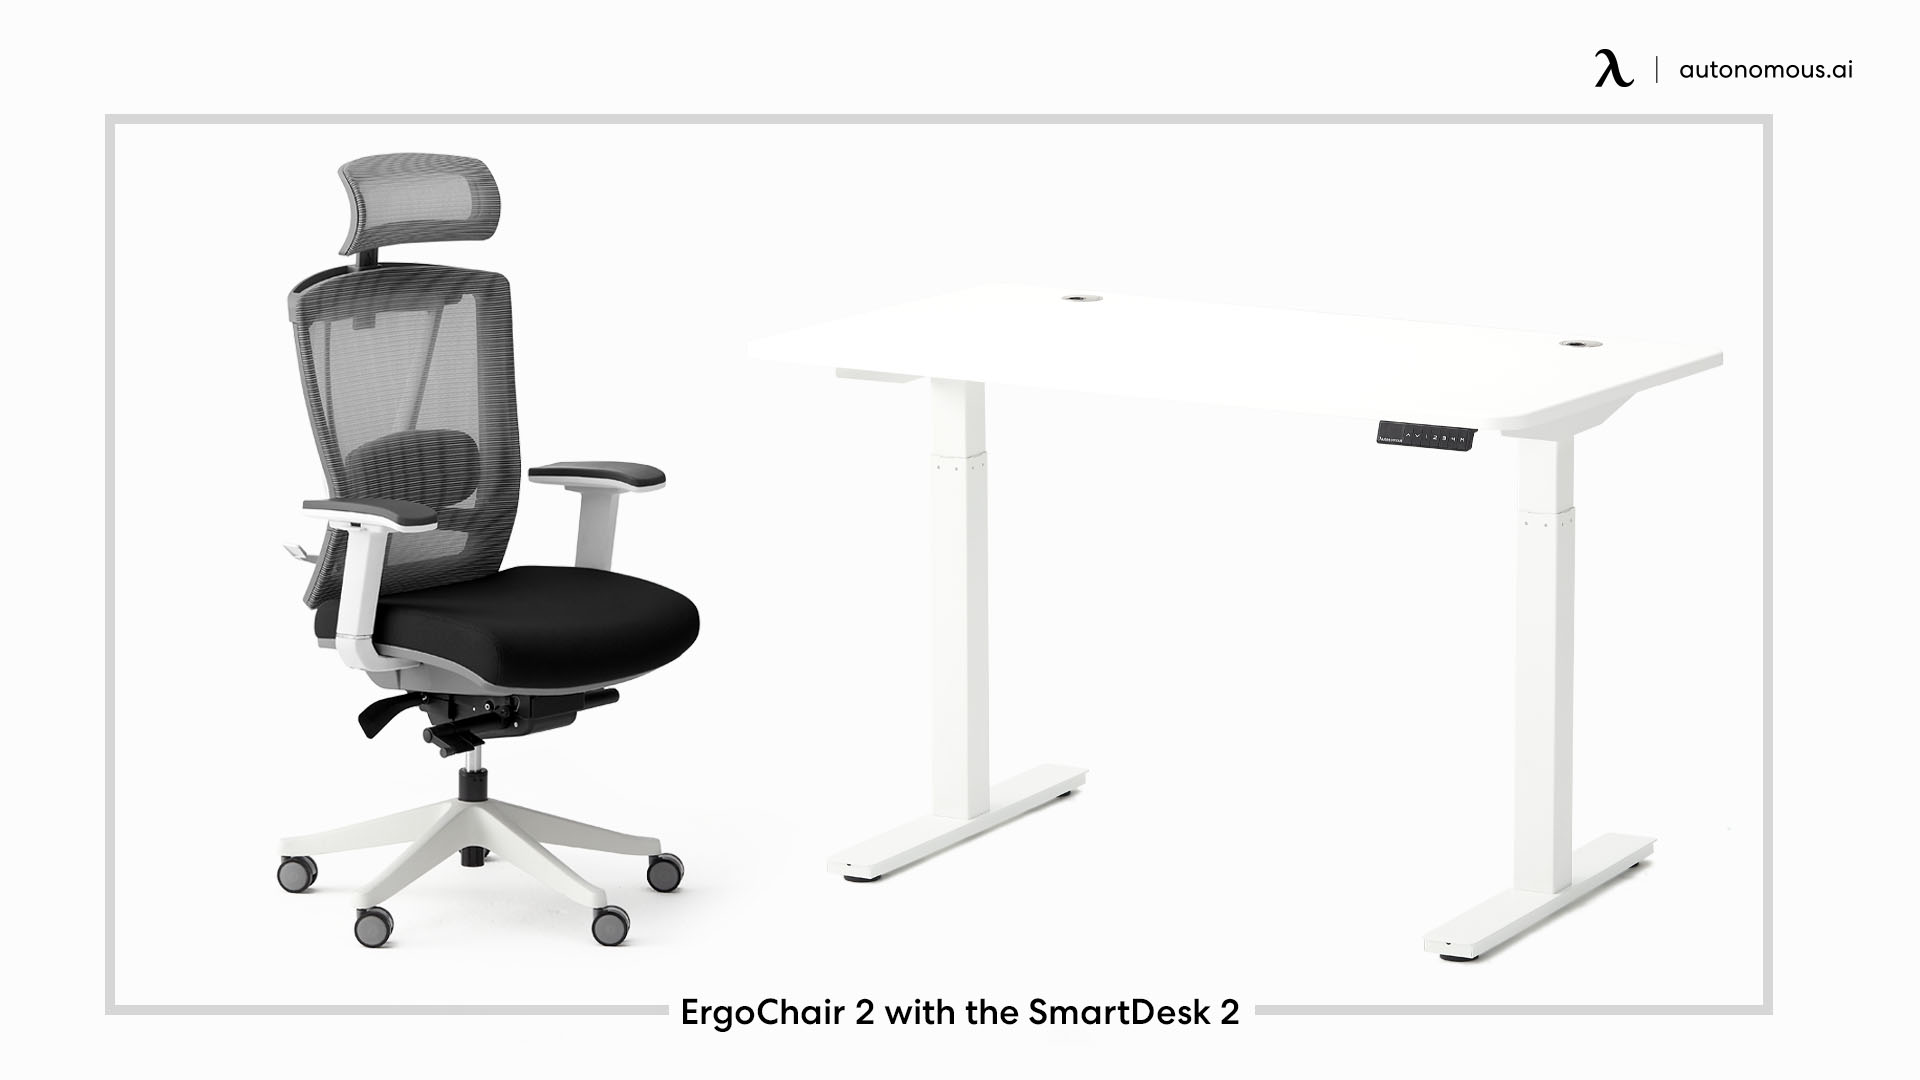 ErgoChair 2 with the SmartDesk 2